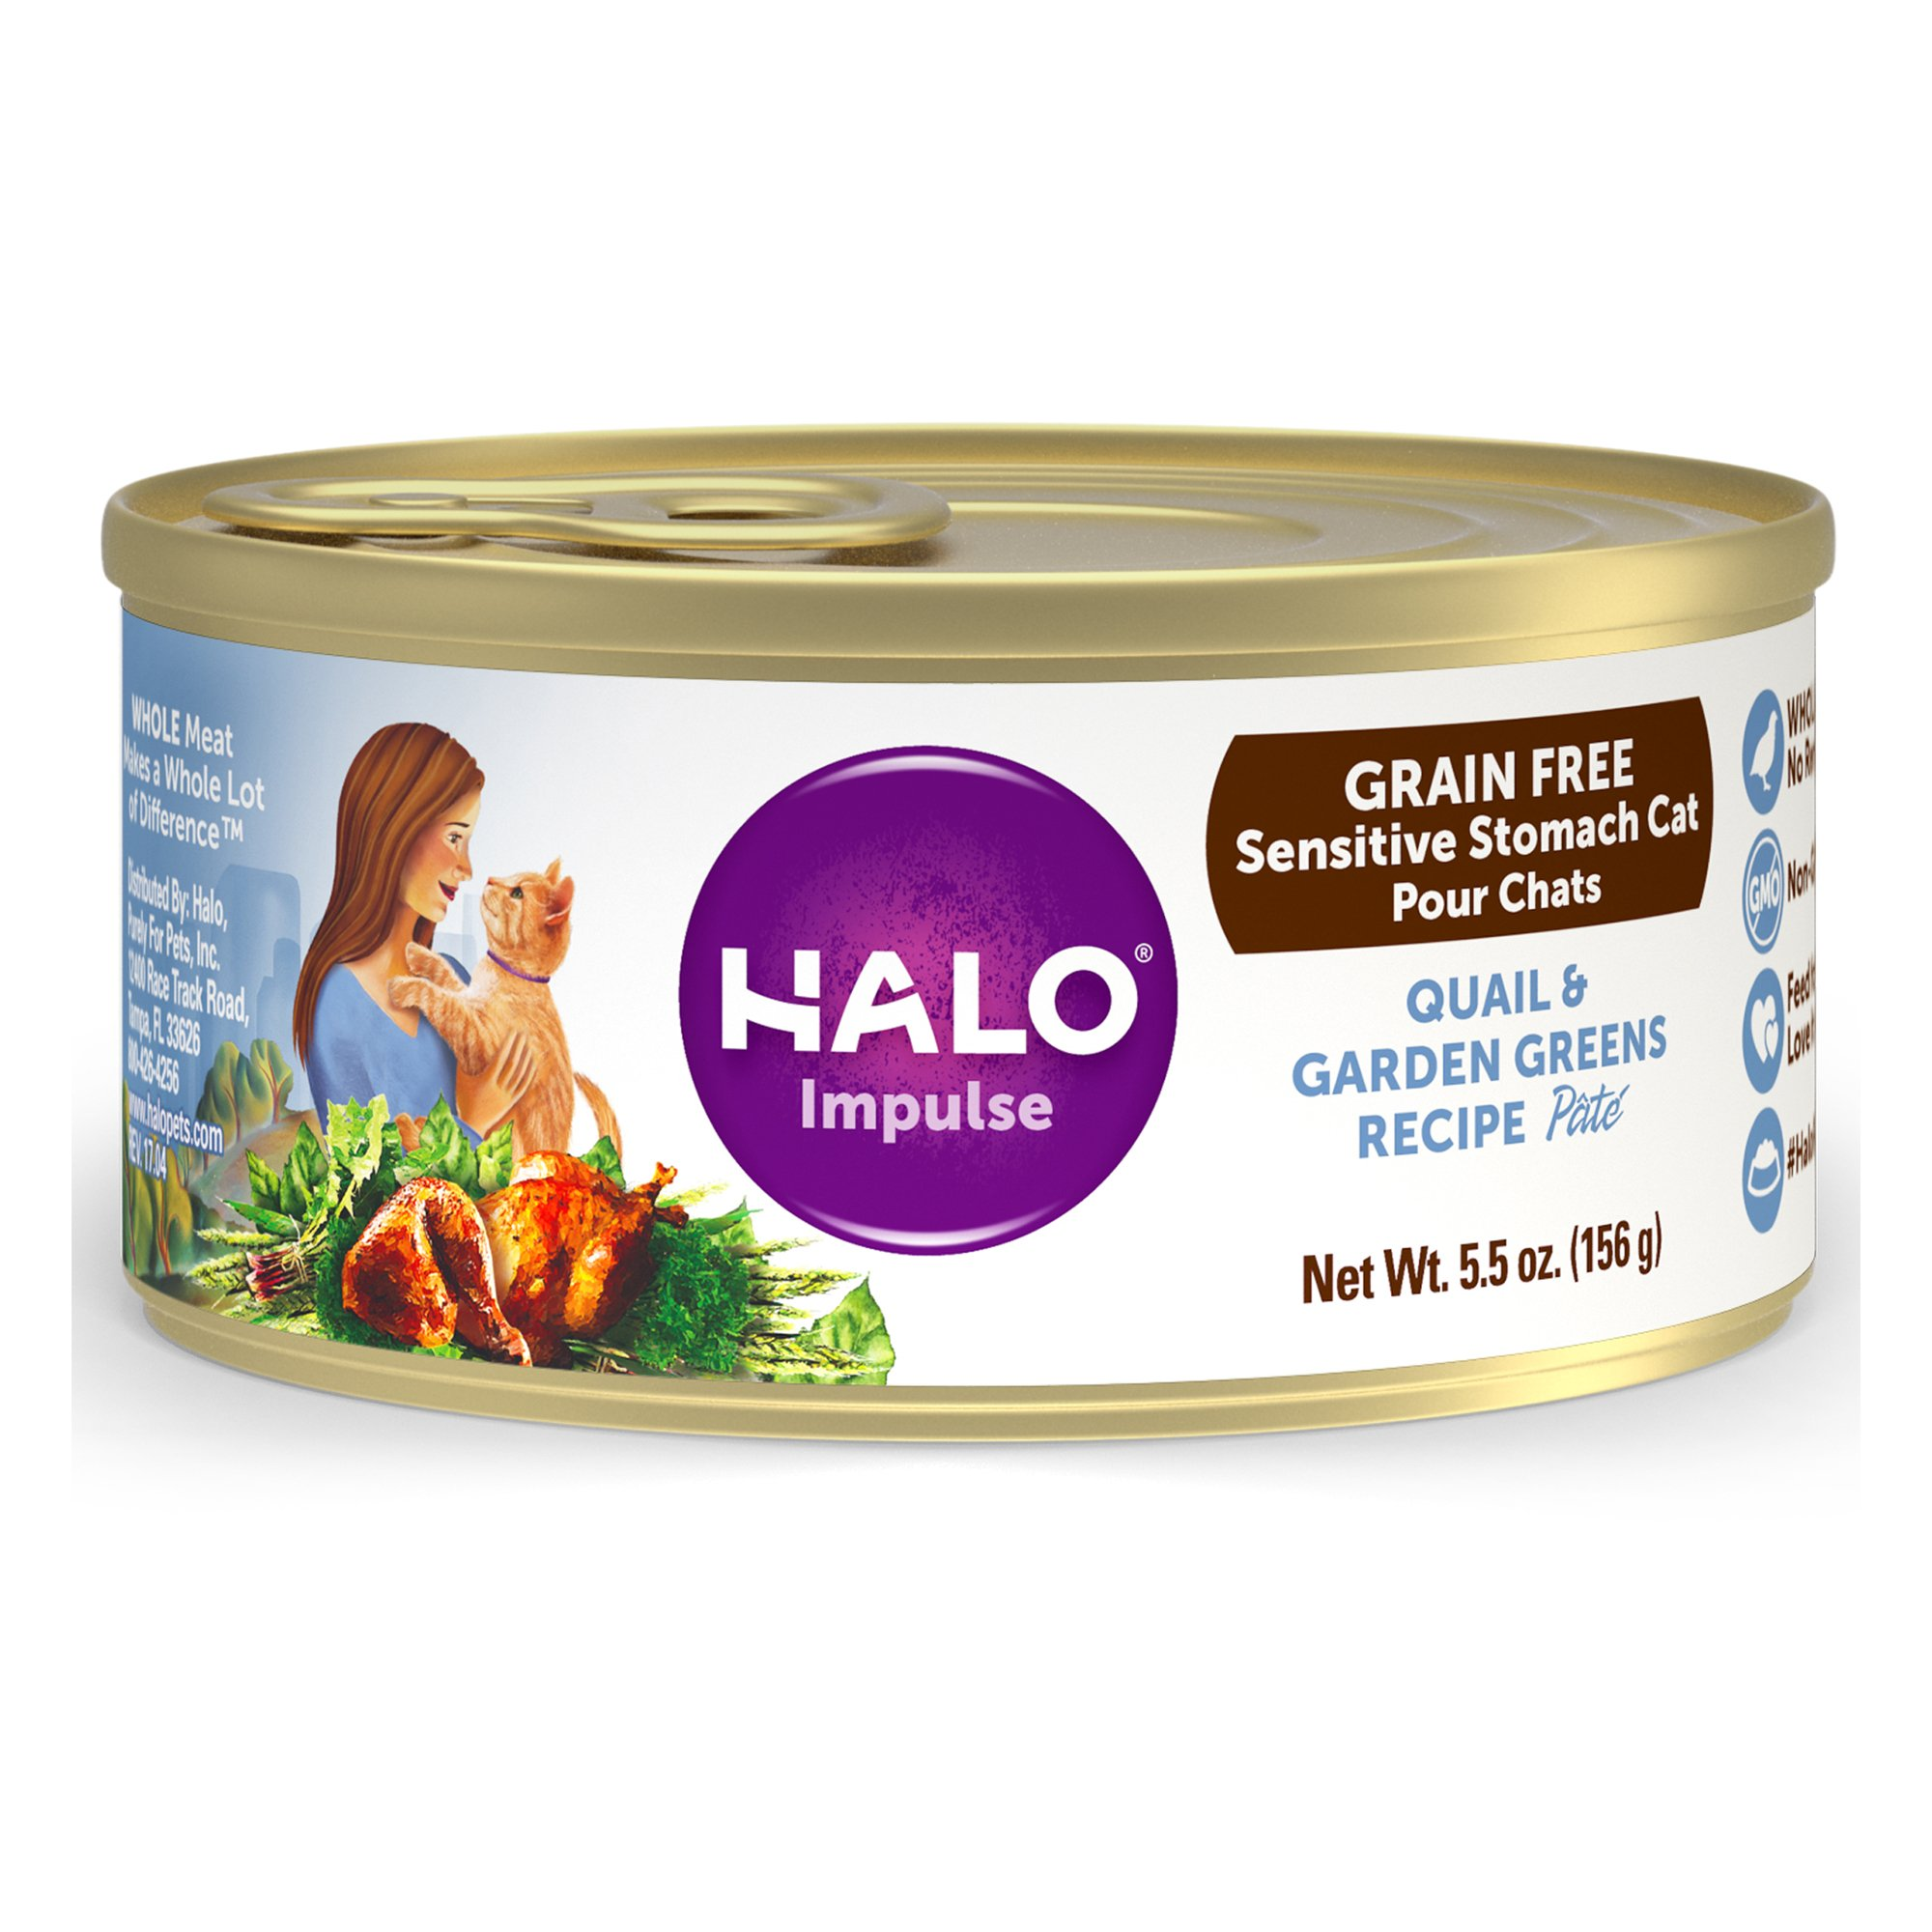 Halo Impulse Grain Free Canned Cat Food, Quail & Greens